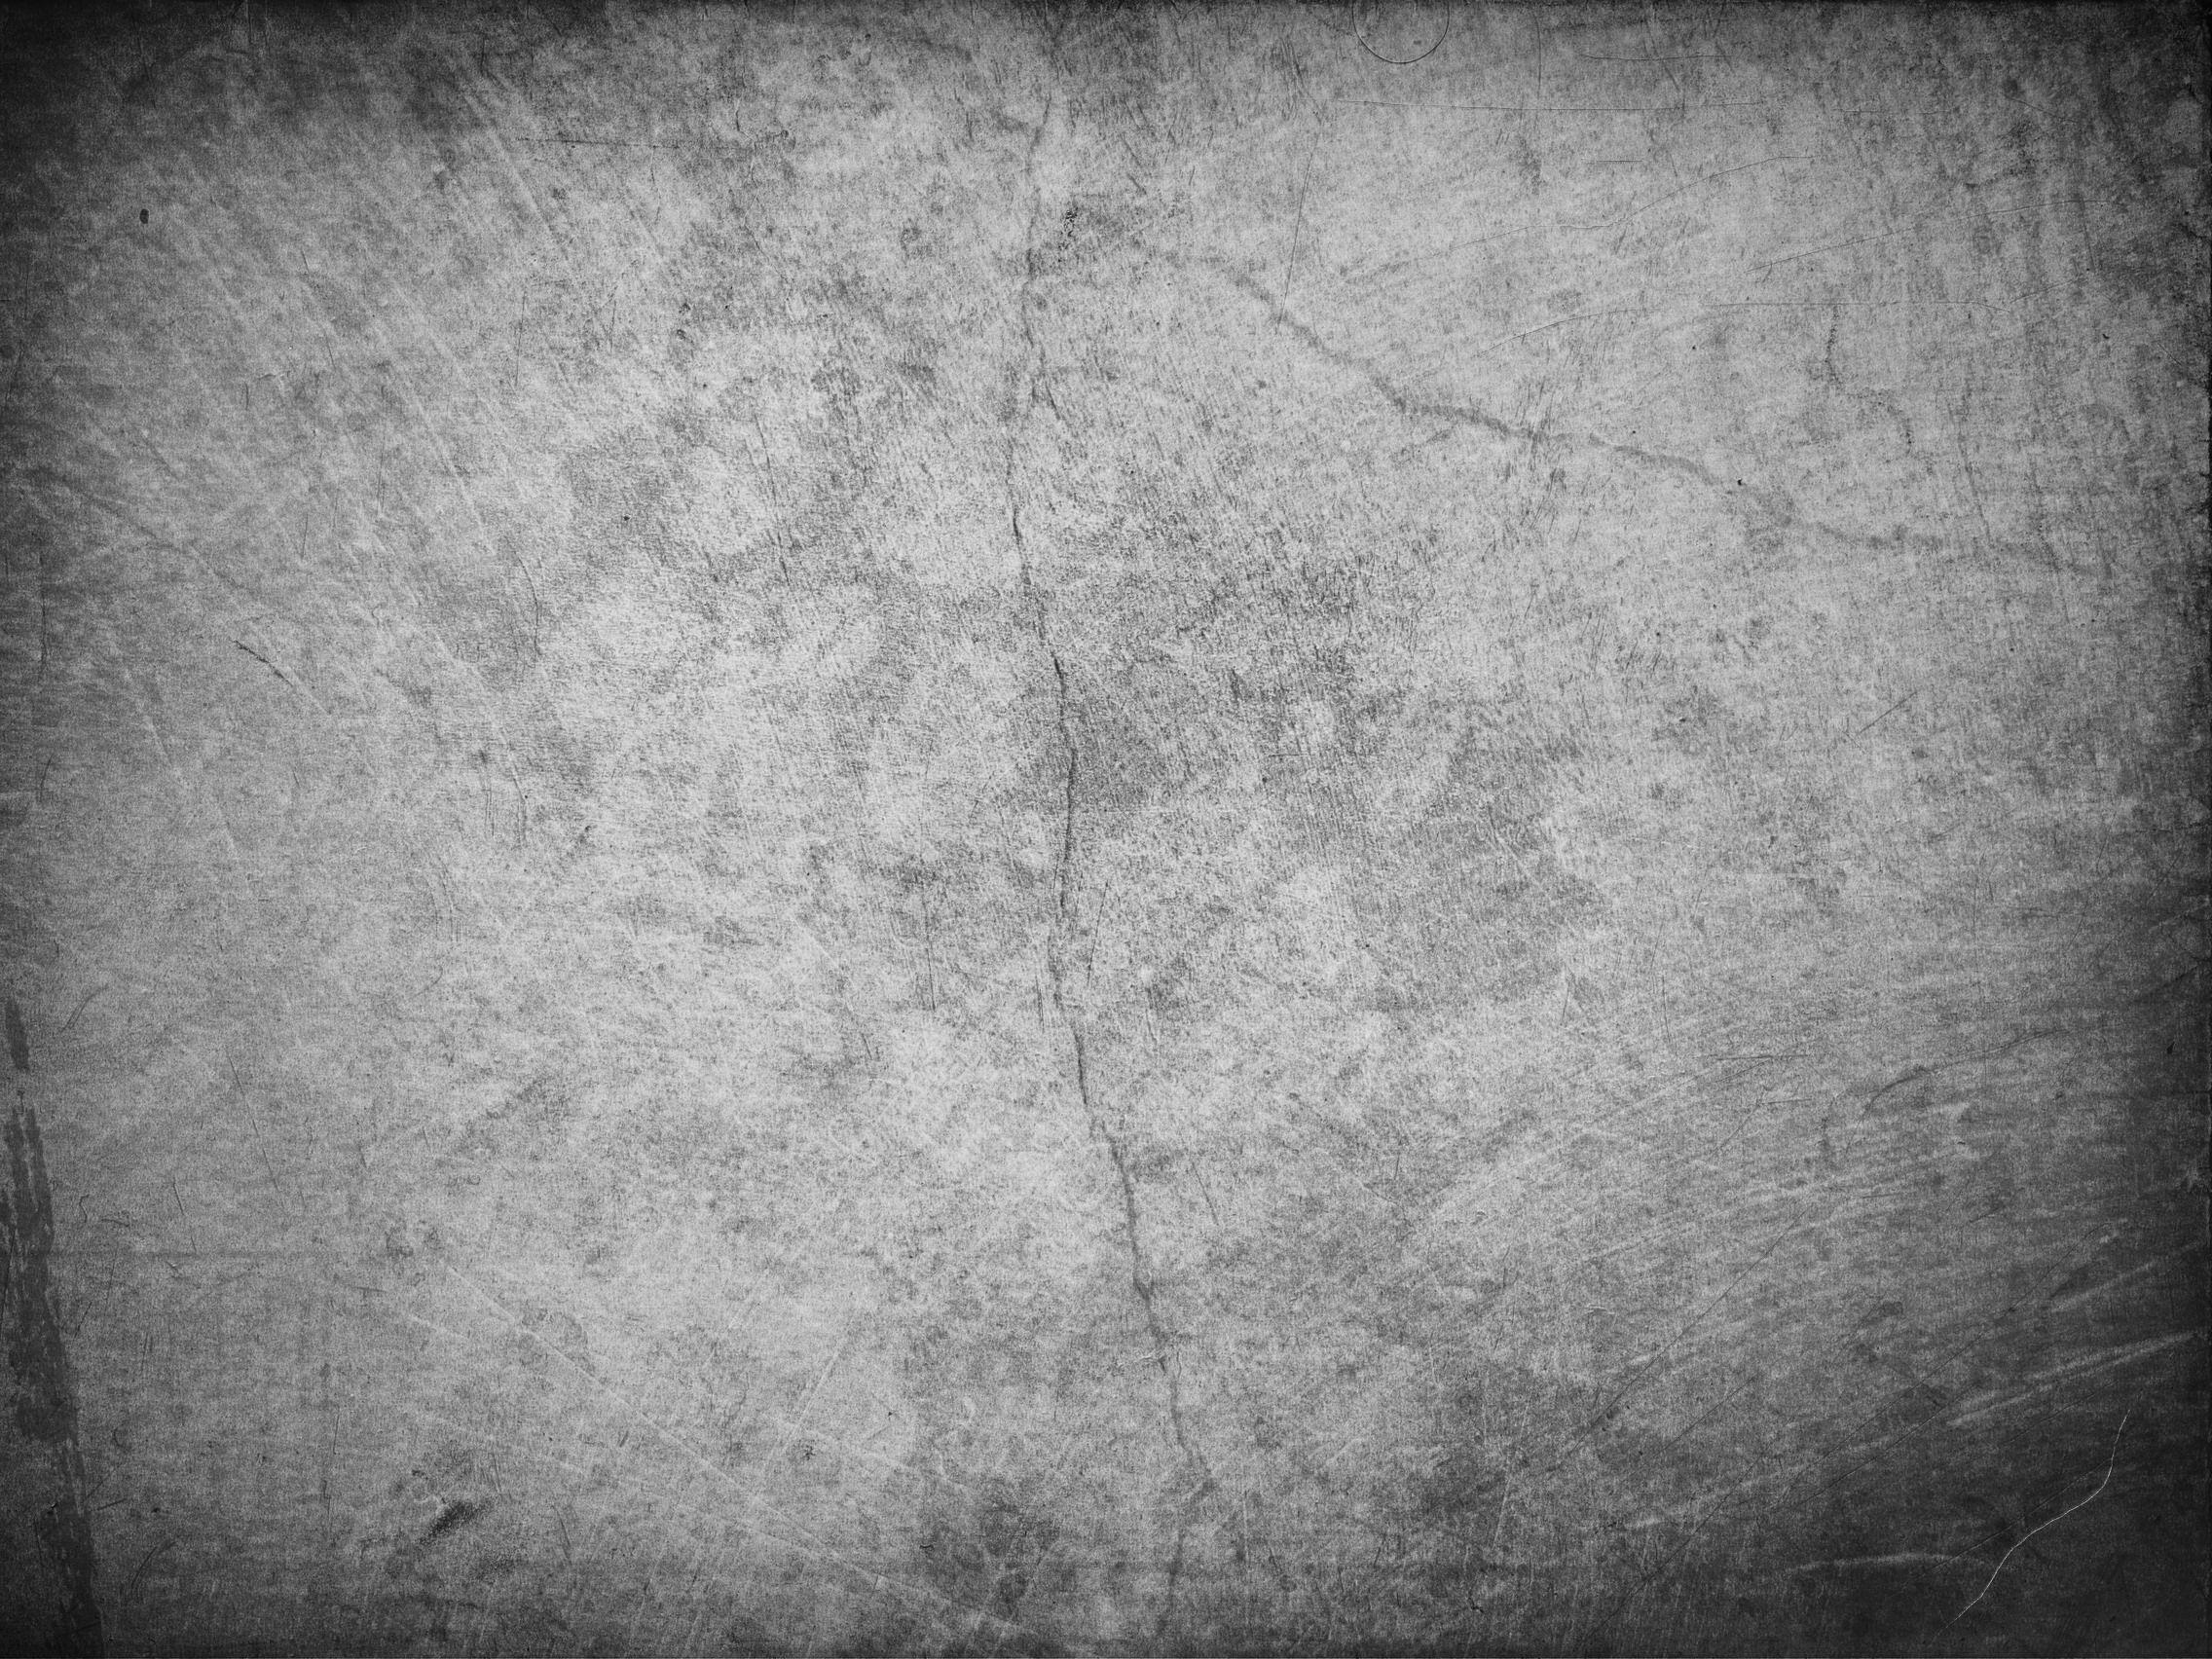 Grunge Texture Iii Wallpaper 2272x1704 Full Hd